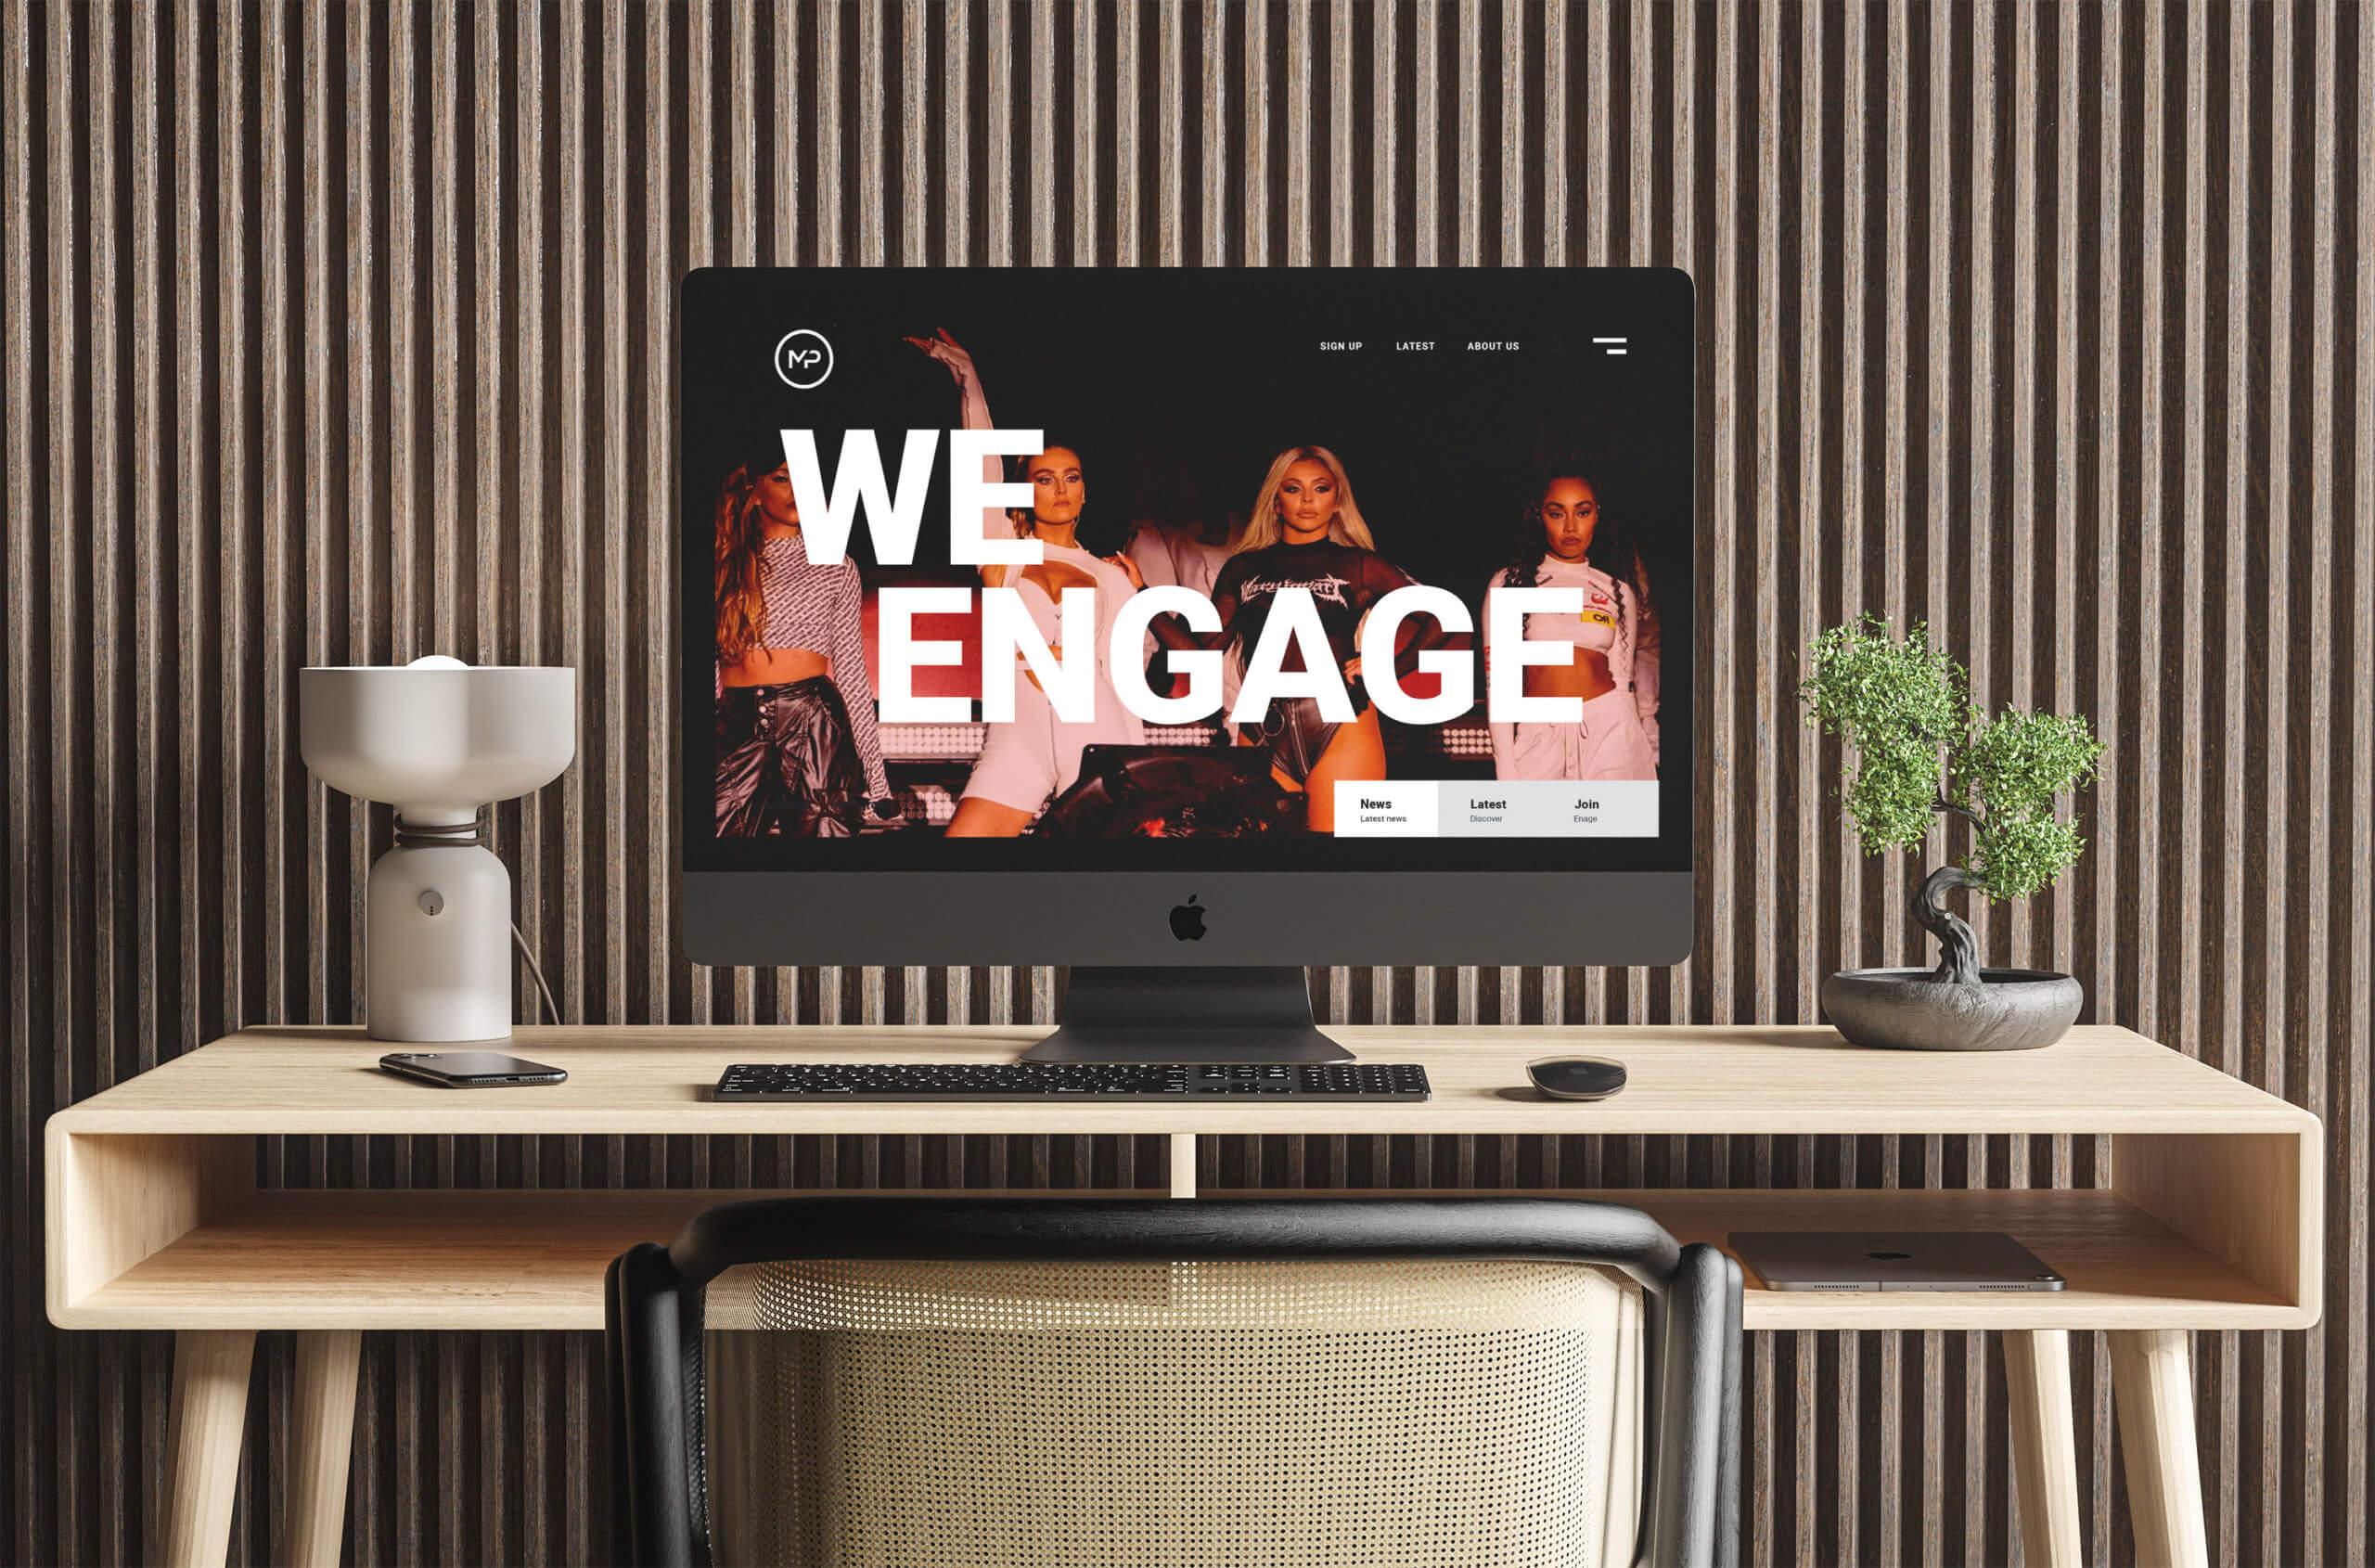 WeEngage Social Platform Design